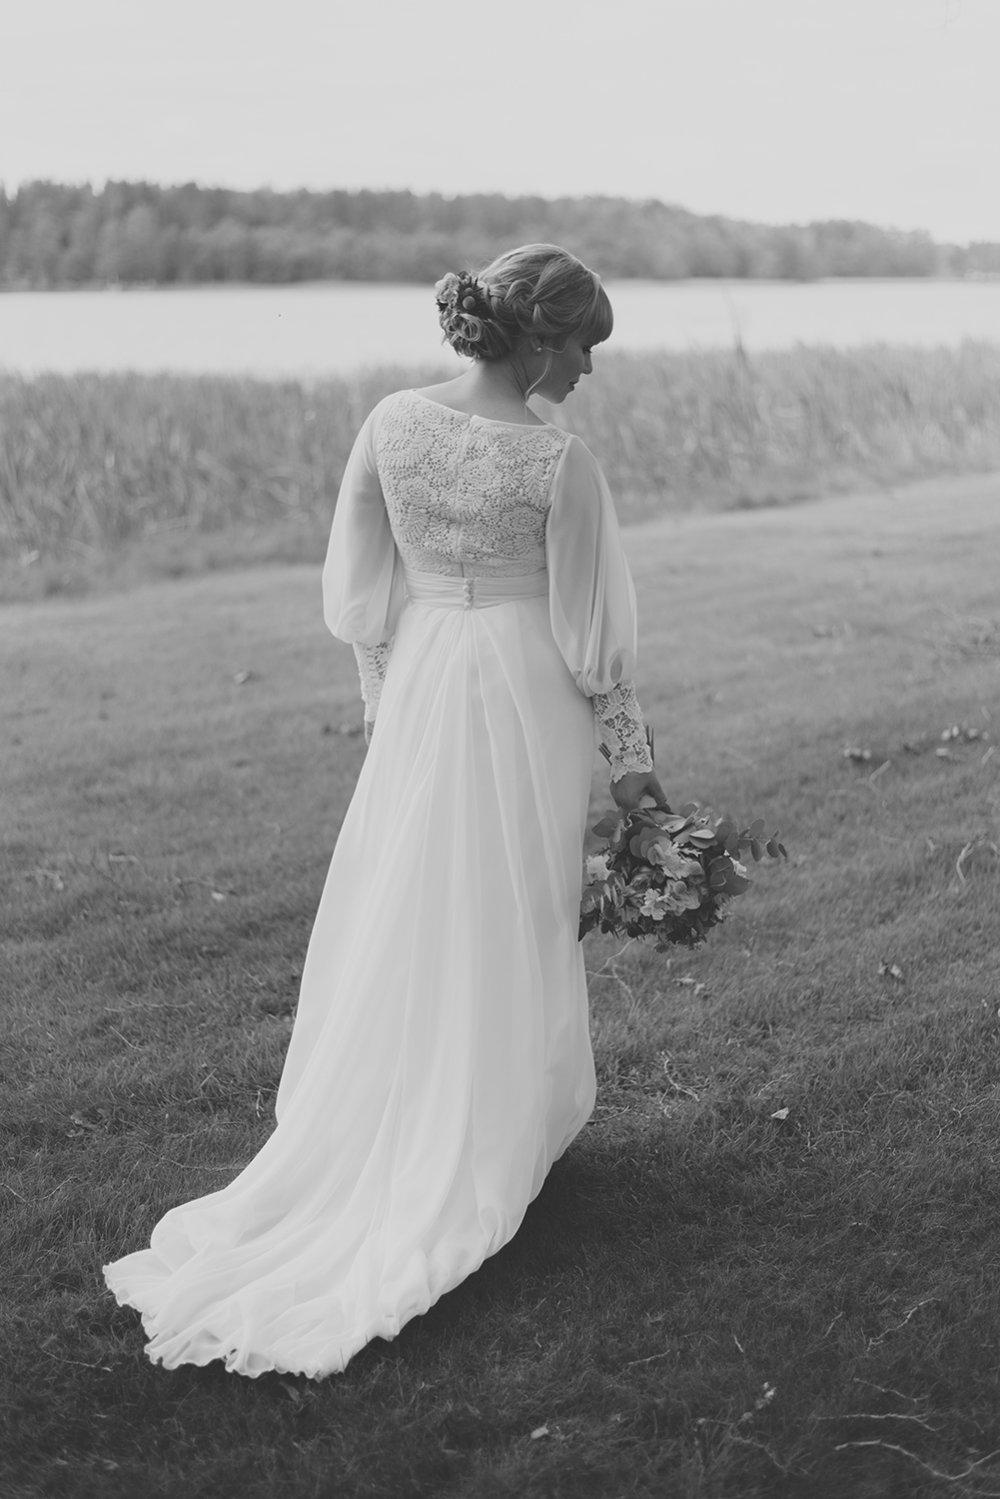 brollopsfotograf-smaland-seos-fotografi-bridal-portrait-outdoor-wedding-sweden